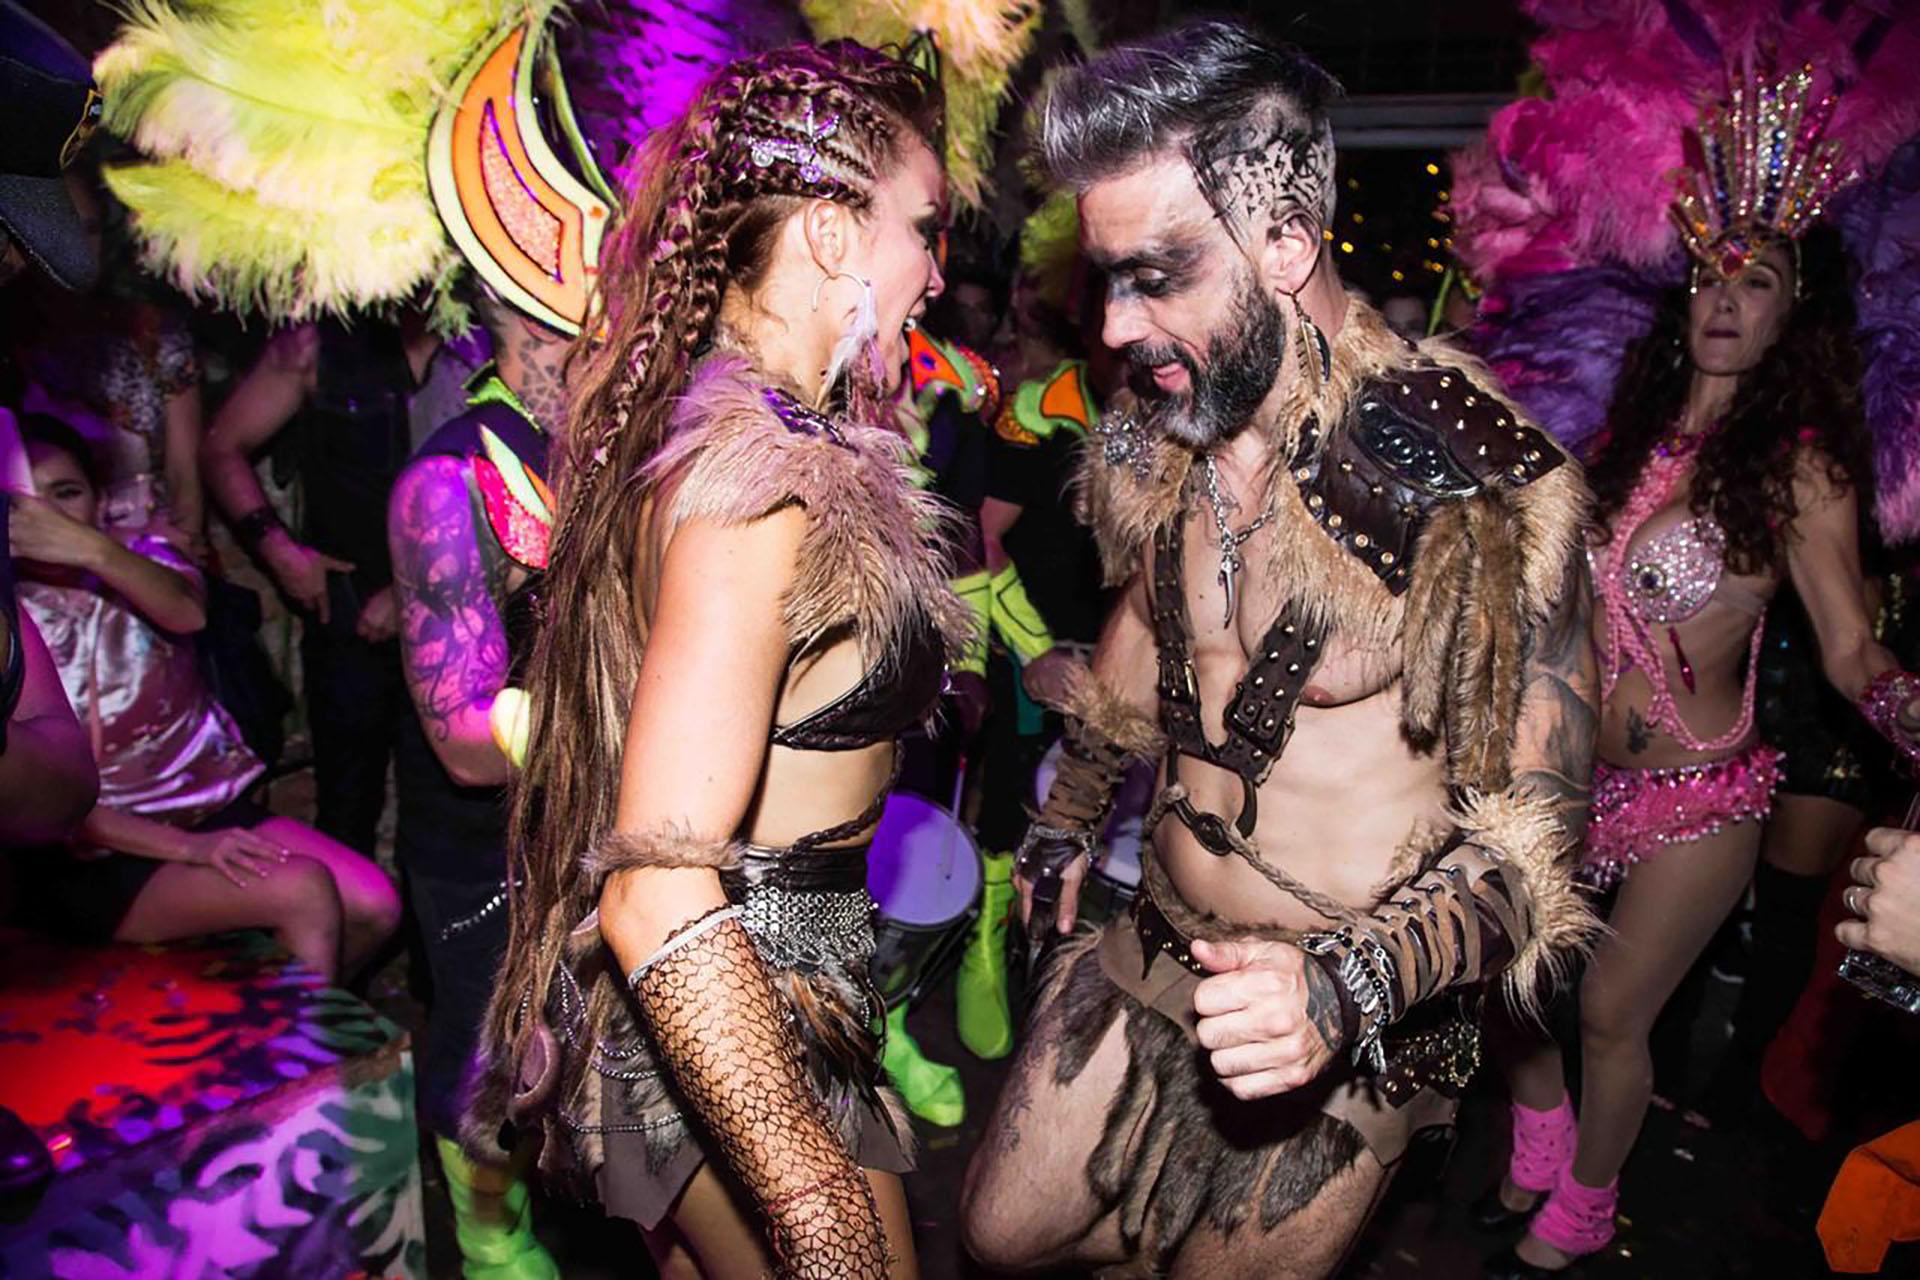 Christian Halbinger y Miriam Lanzoni, danzando